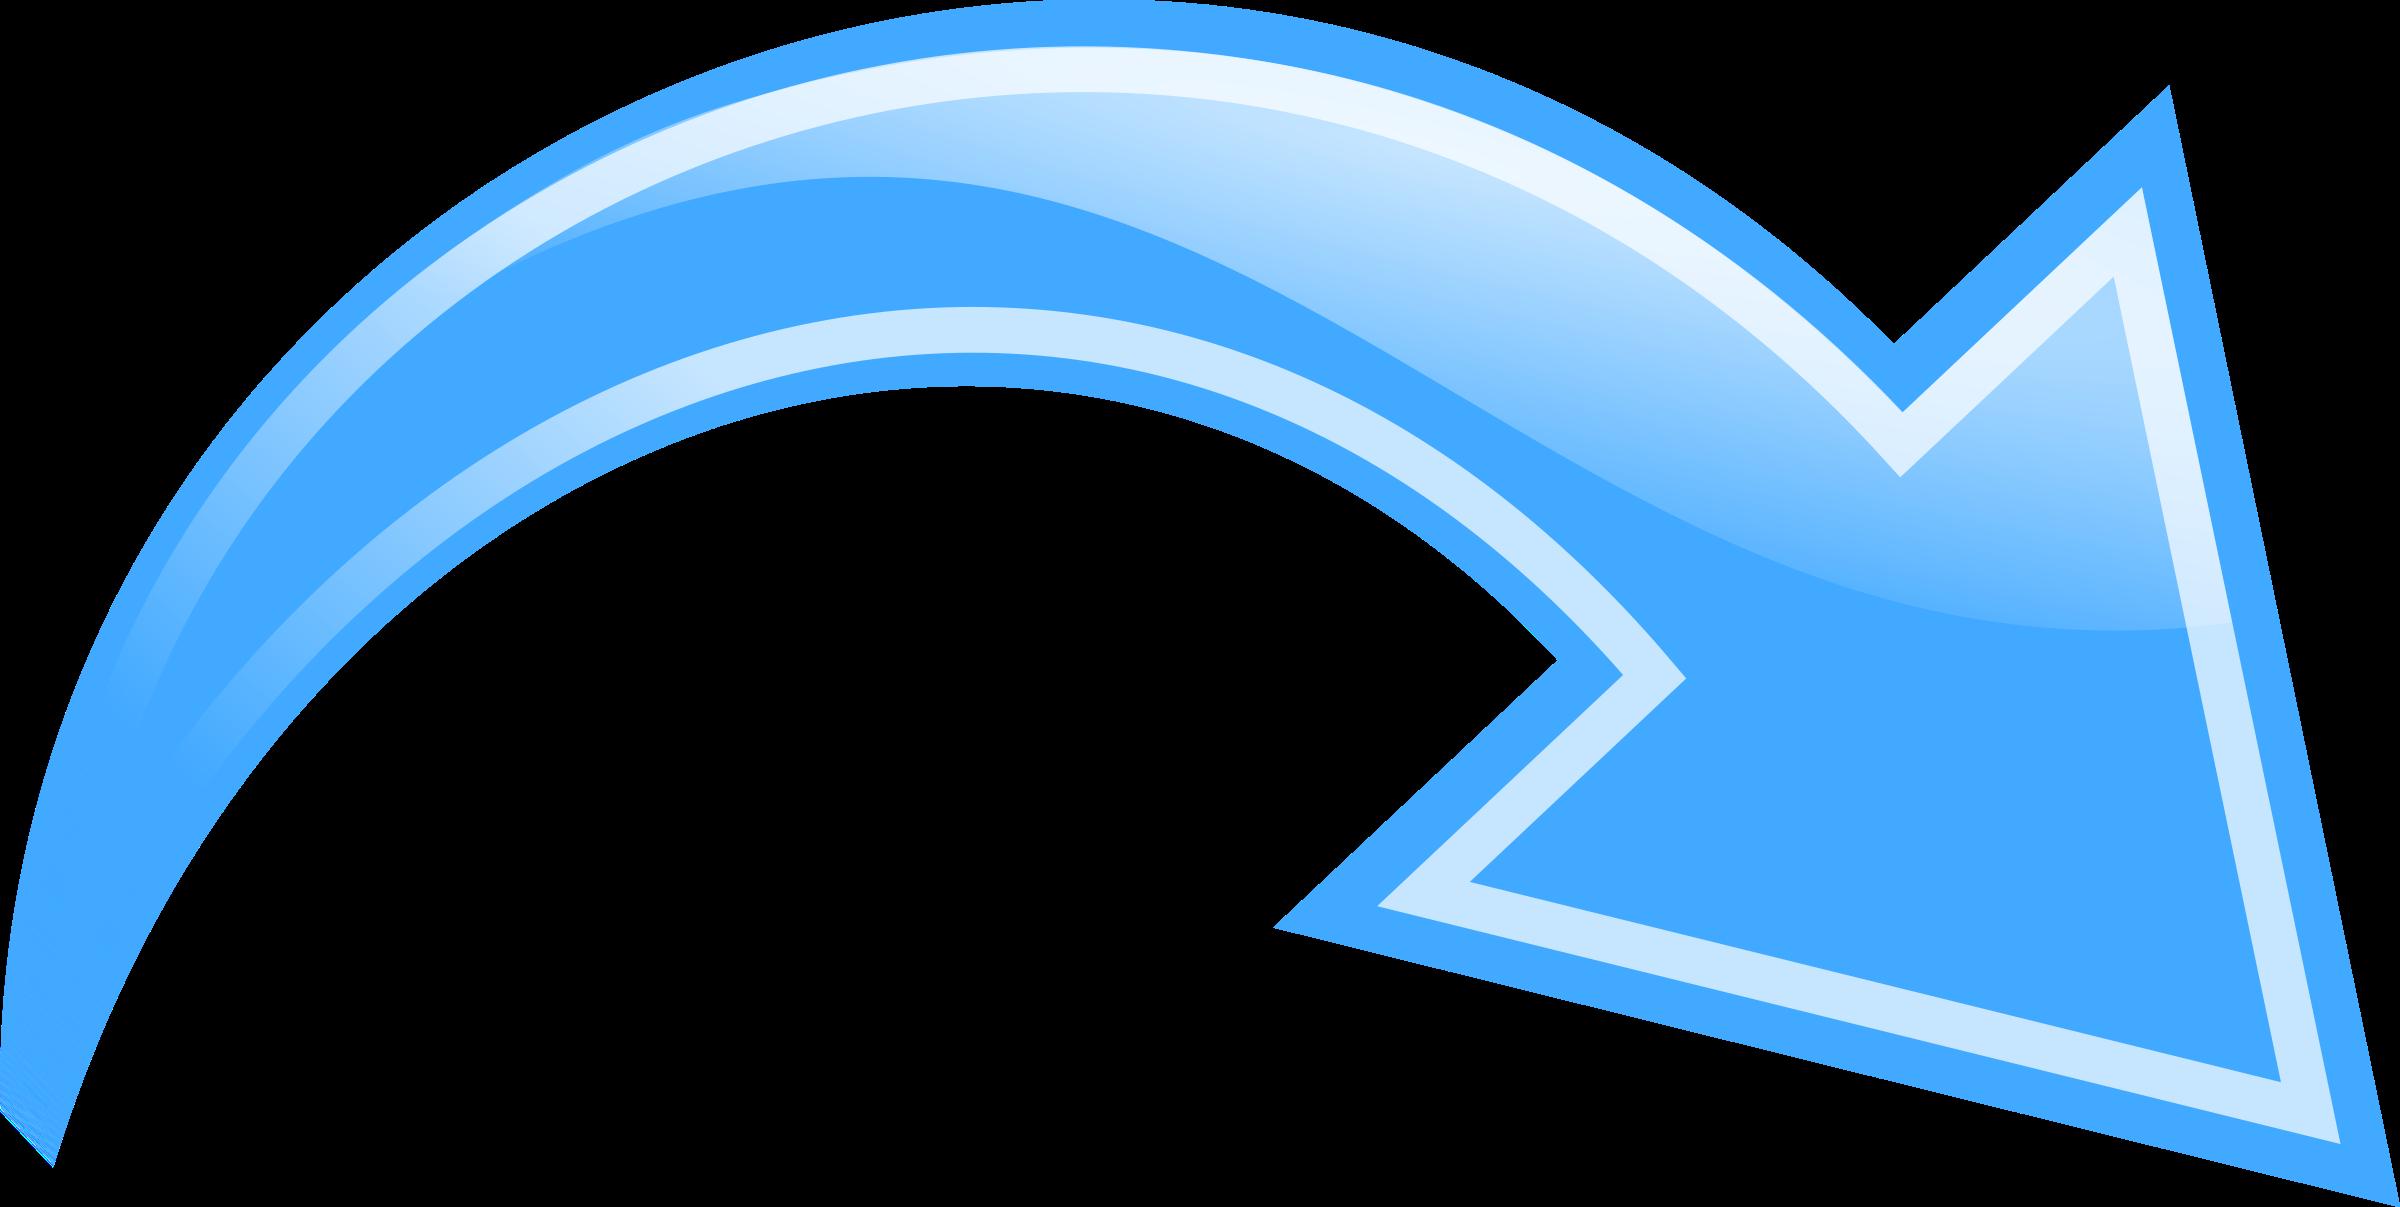 Curved Arrow Blue